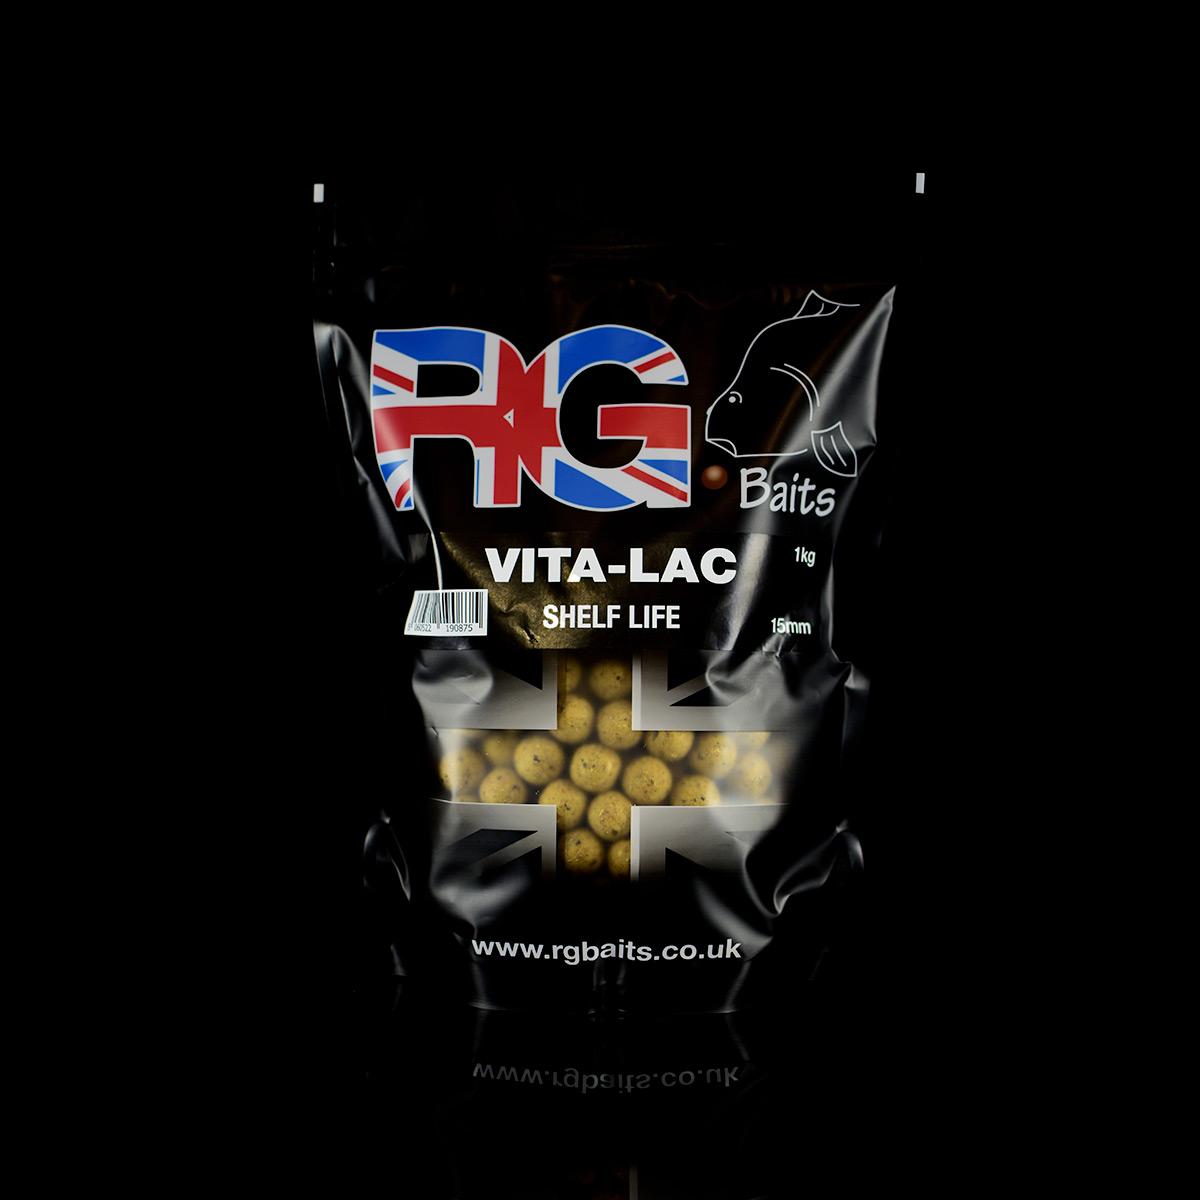 Vita-lac Shelf Life Baits